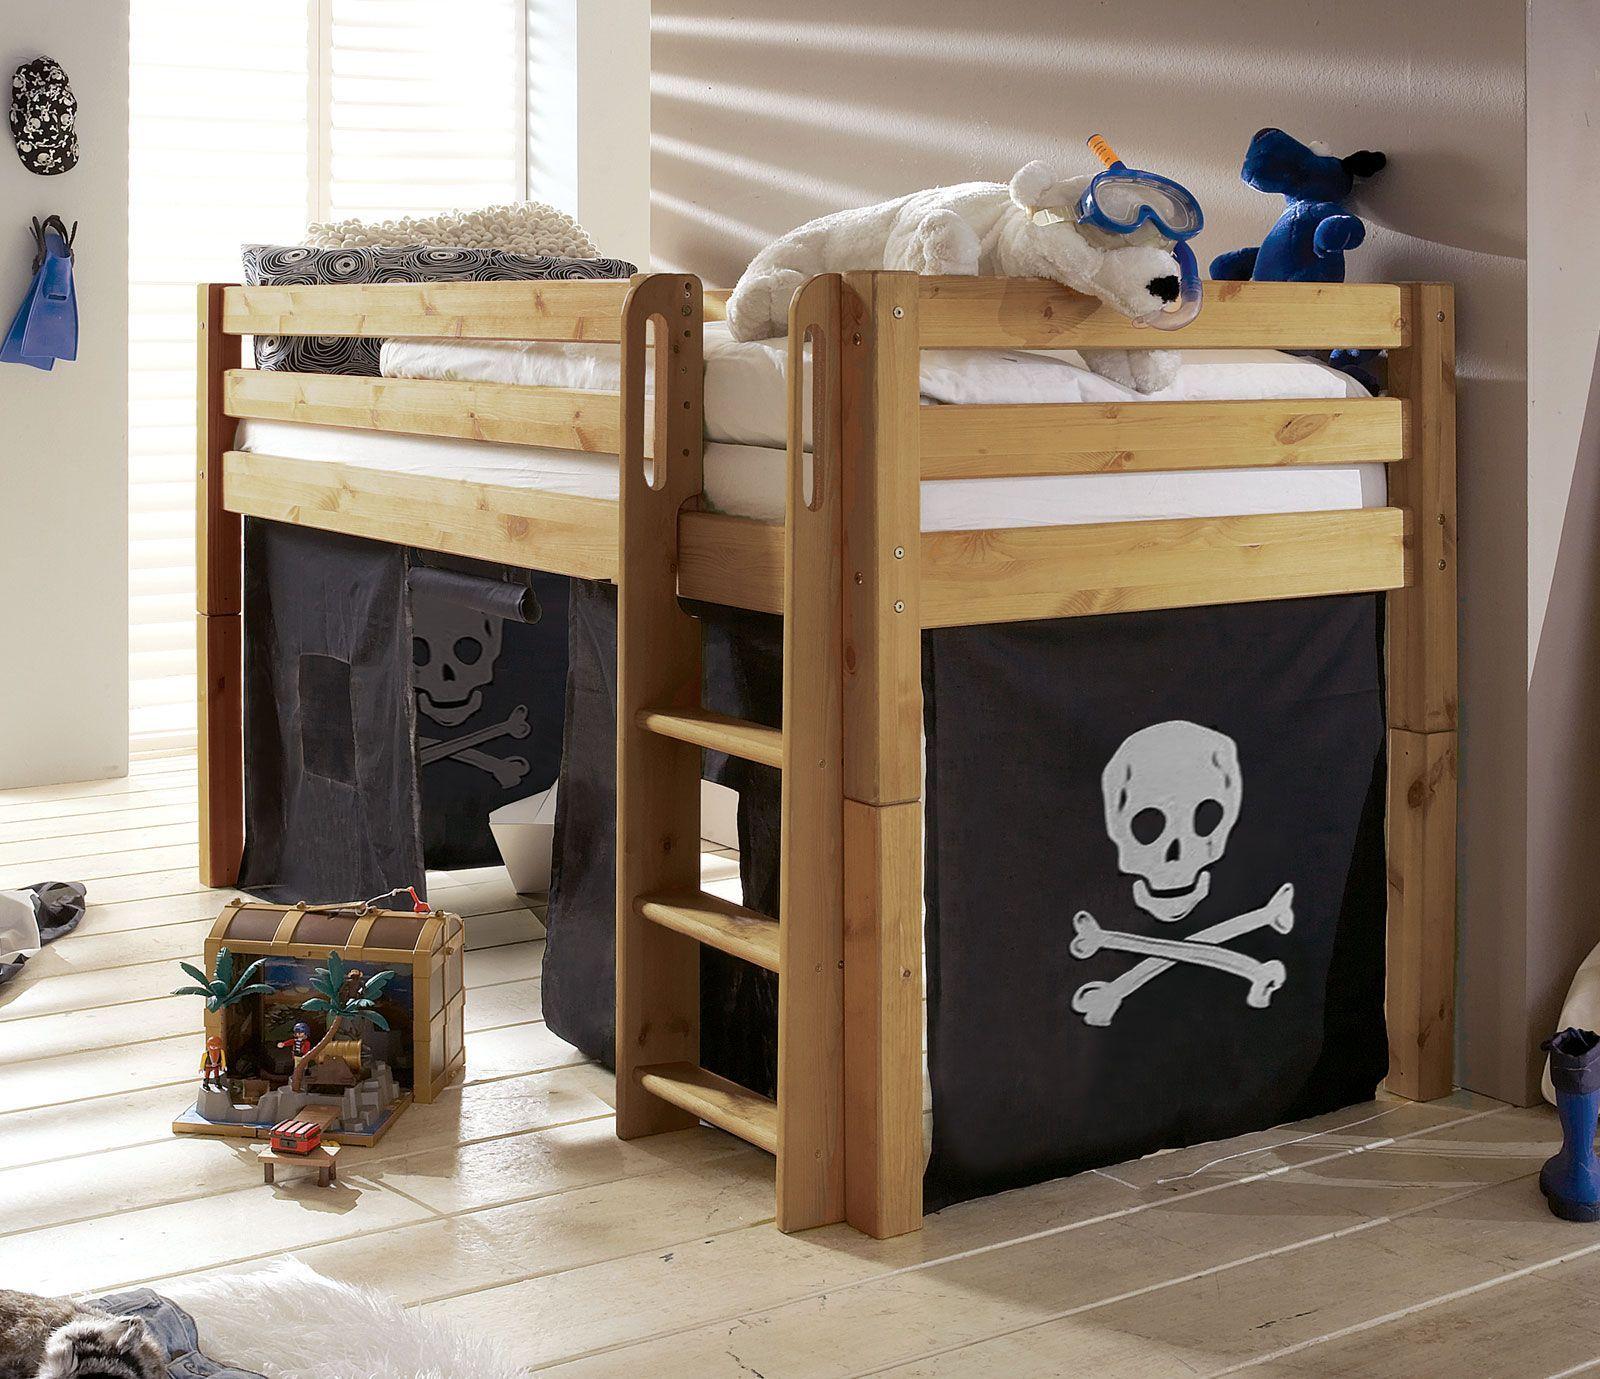 mini hochbett mit rutsche t v gepr ft kids paradise. Black Bedroom Furniture Sets. Home Design Ideas